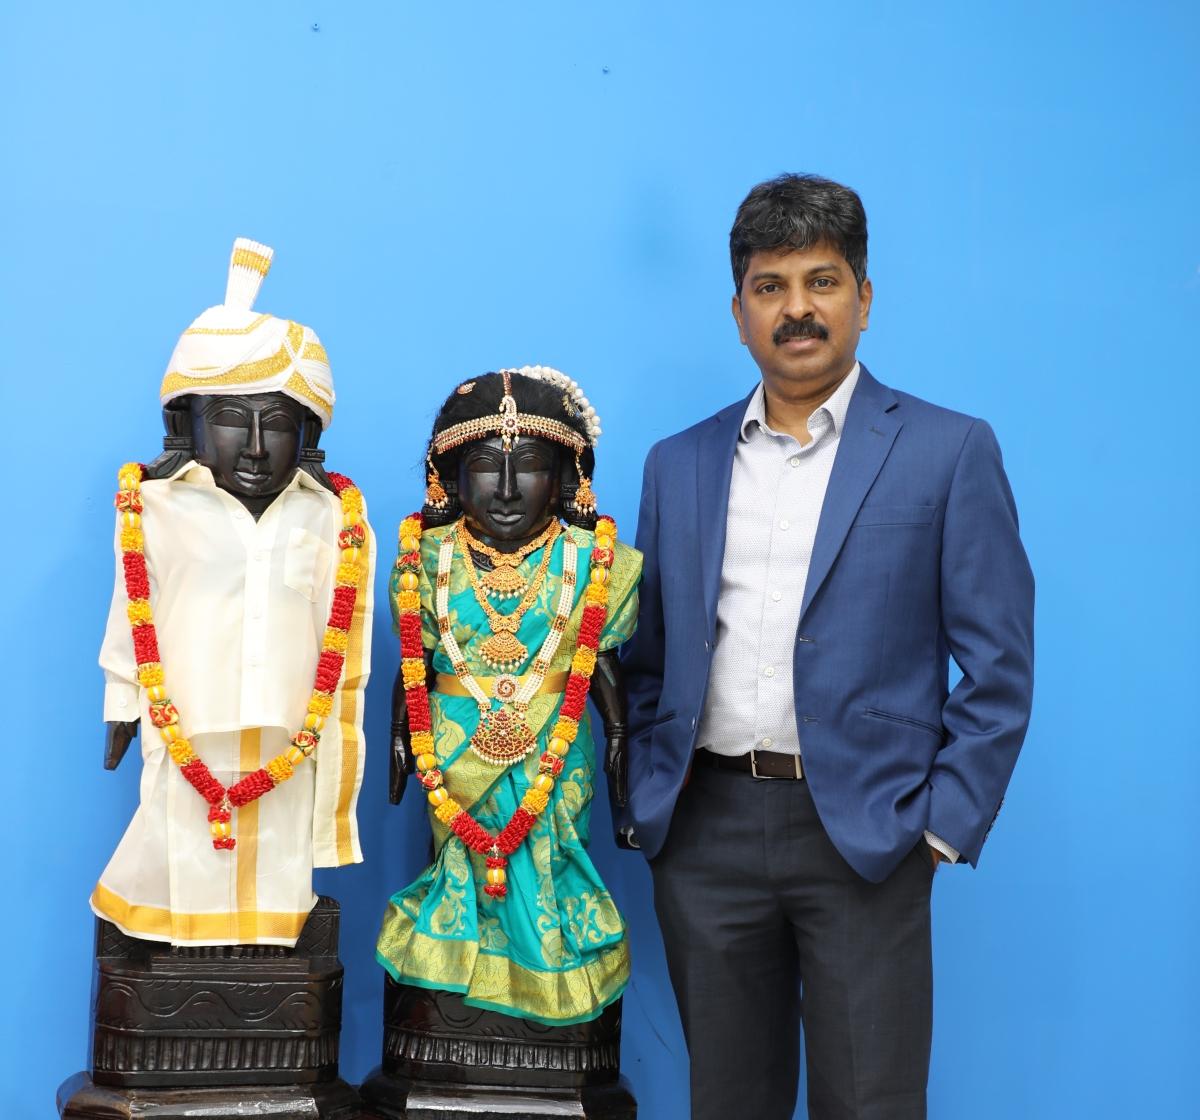 I take any outcome in a positive way, says Matrimony.com's Murugavel Janakiraman to BrandSutra